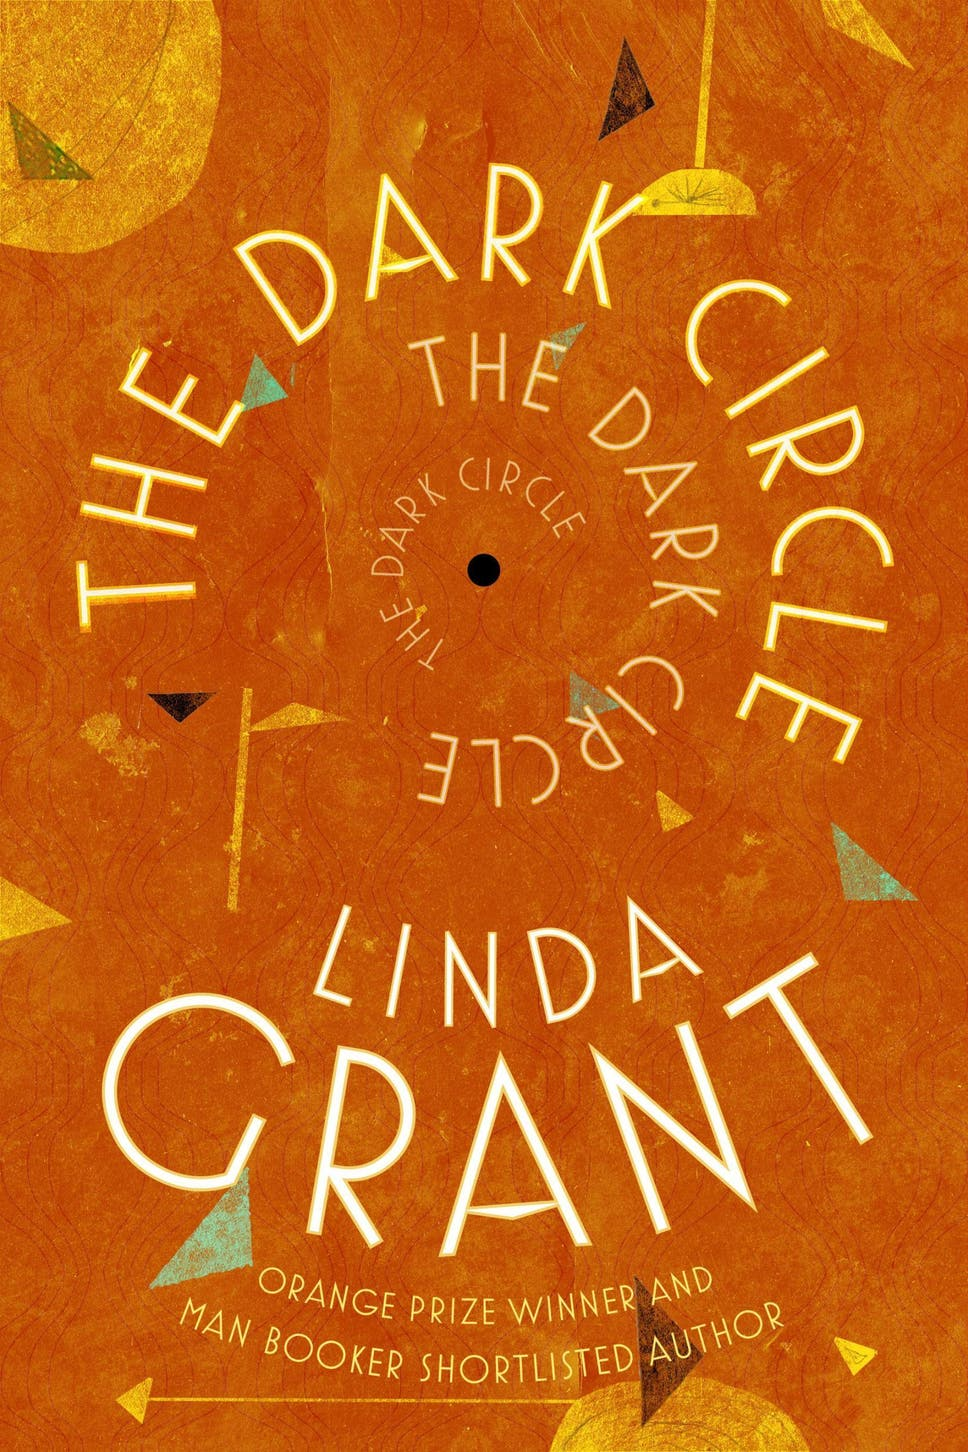 Image result for dark circle grant